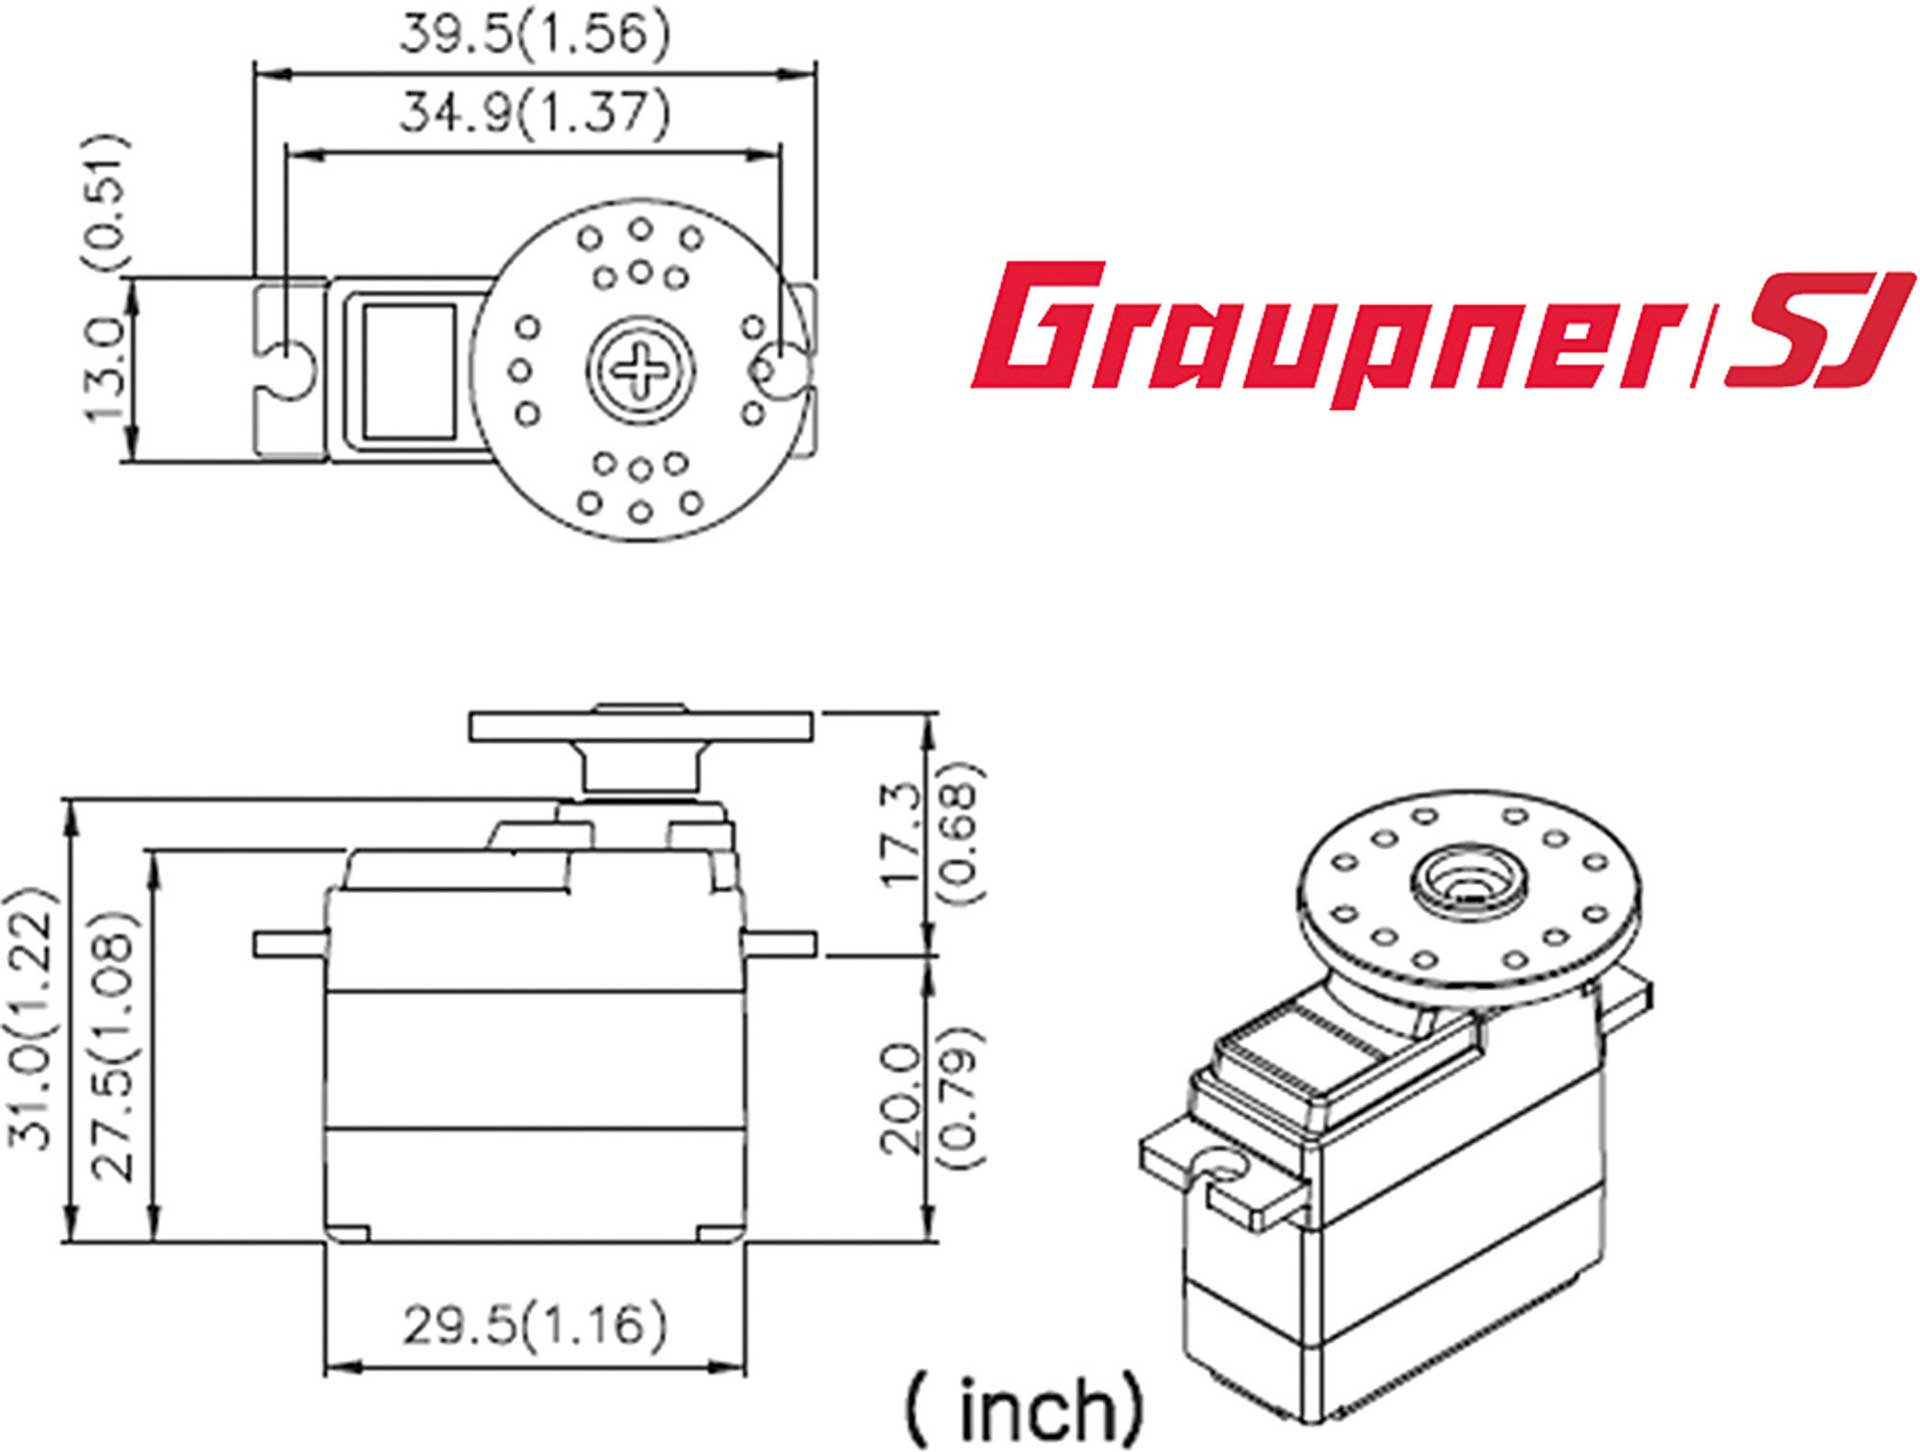 GRAUPNER DES 587 BB MG DIGITAL SERVO